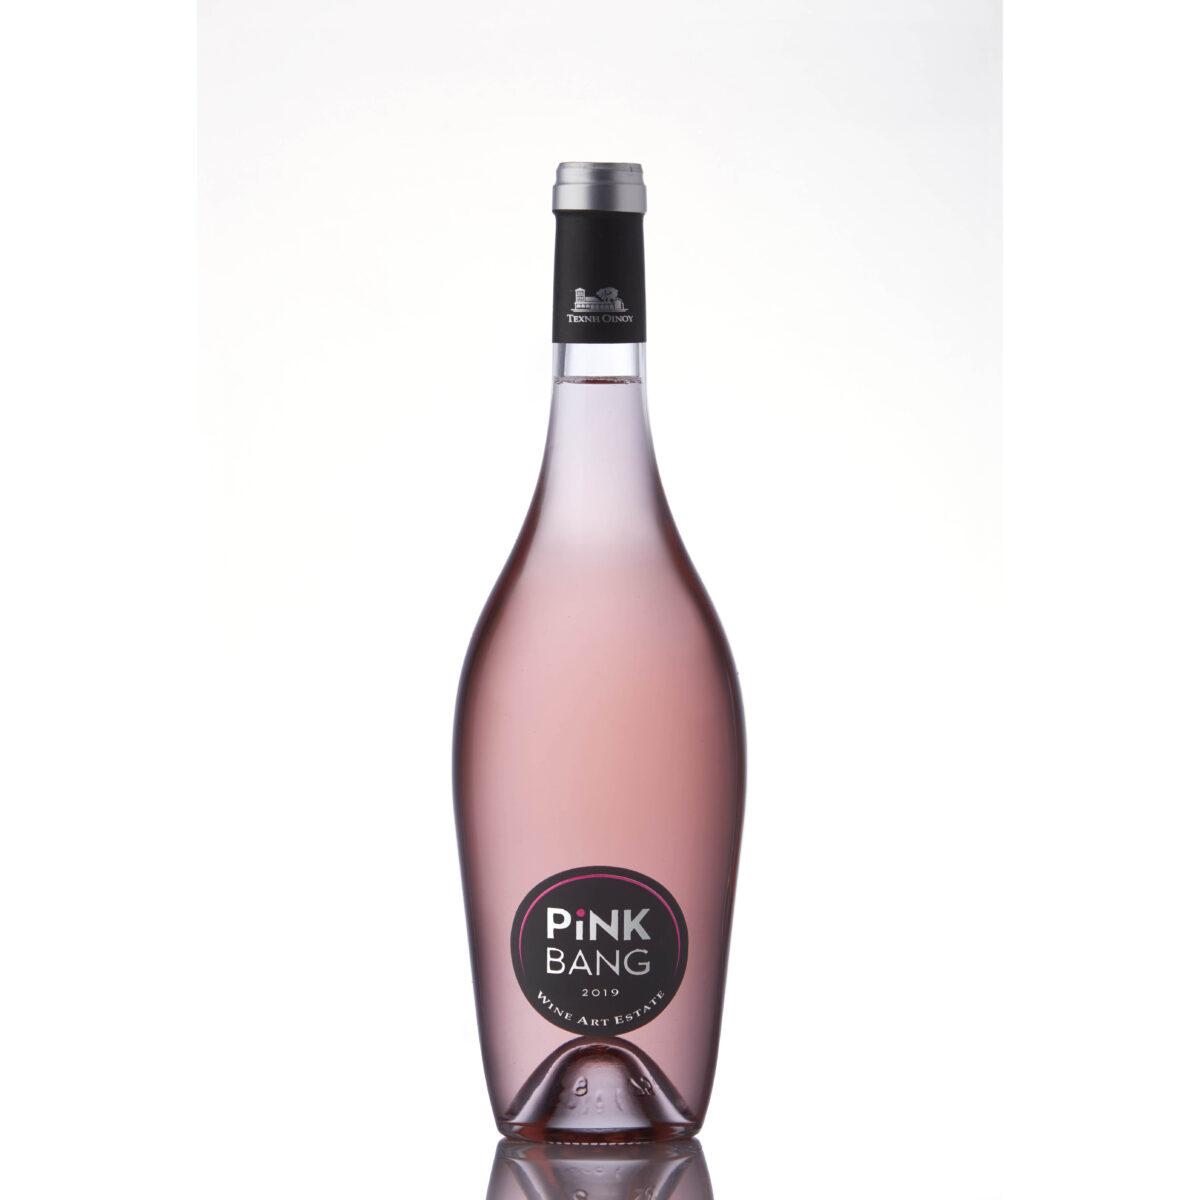 PINK BANG 2019